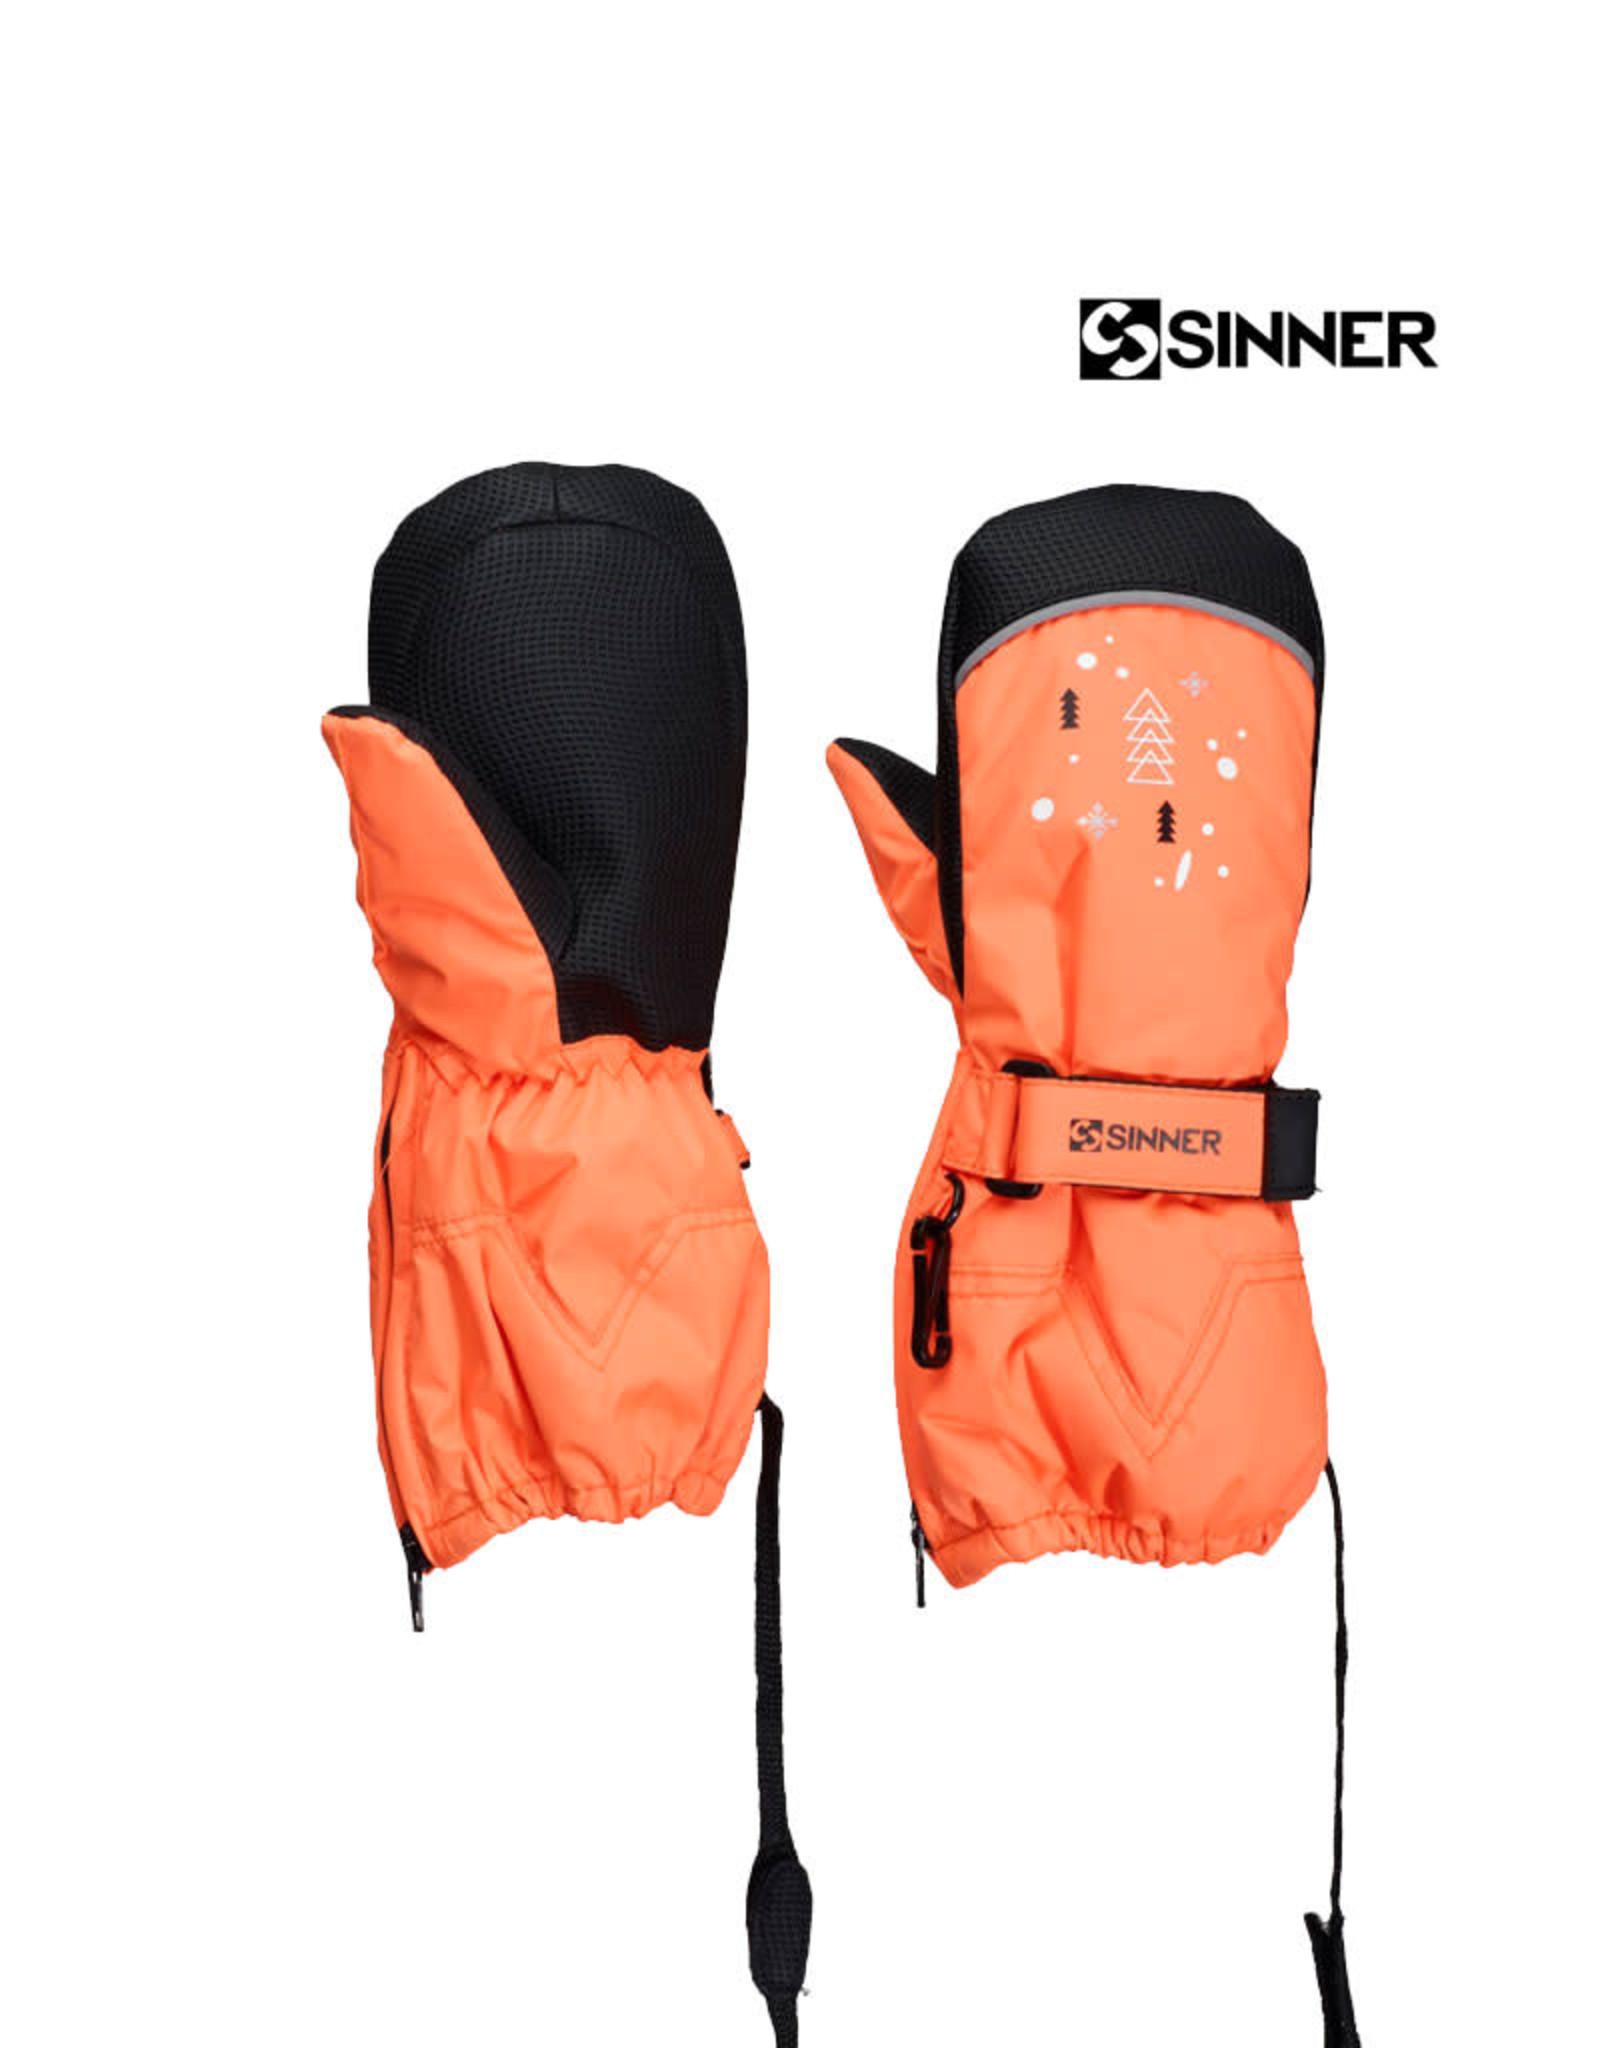 SINNER SINNER WANTEN TIMBER mitten Neon Orange UNISEX S